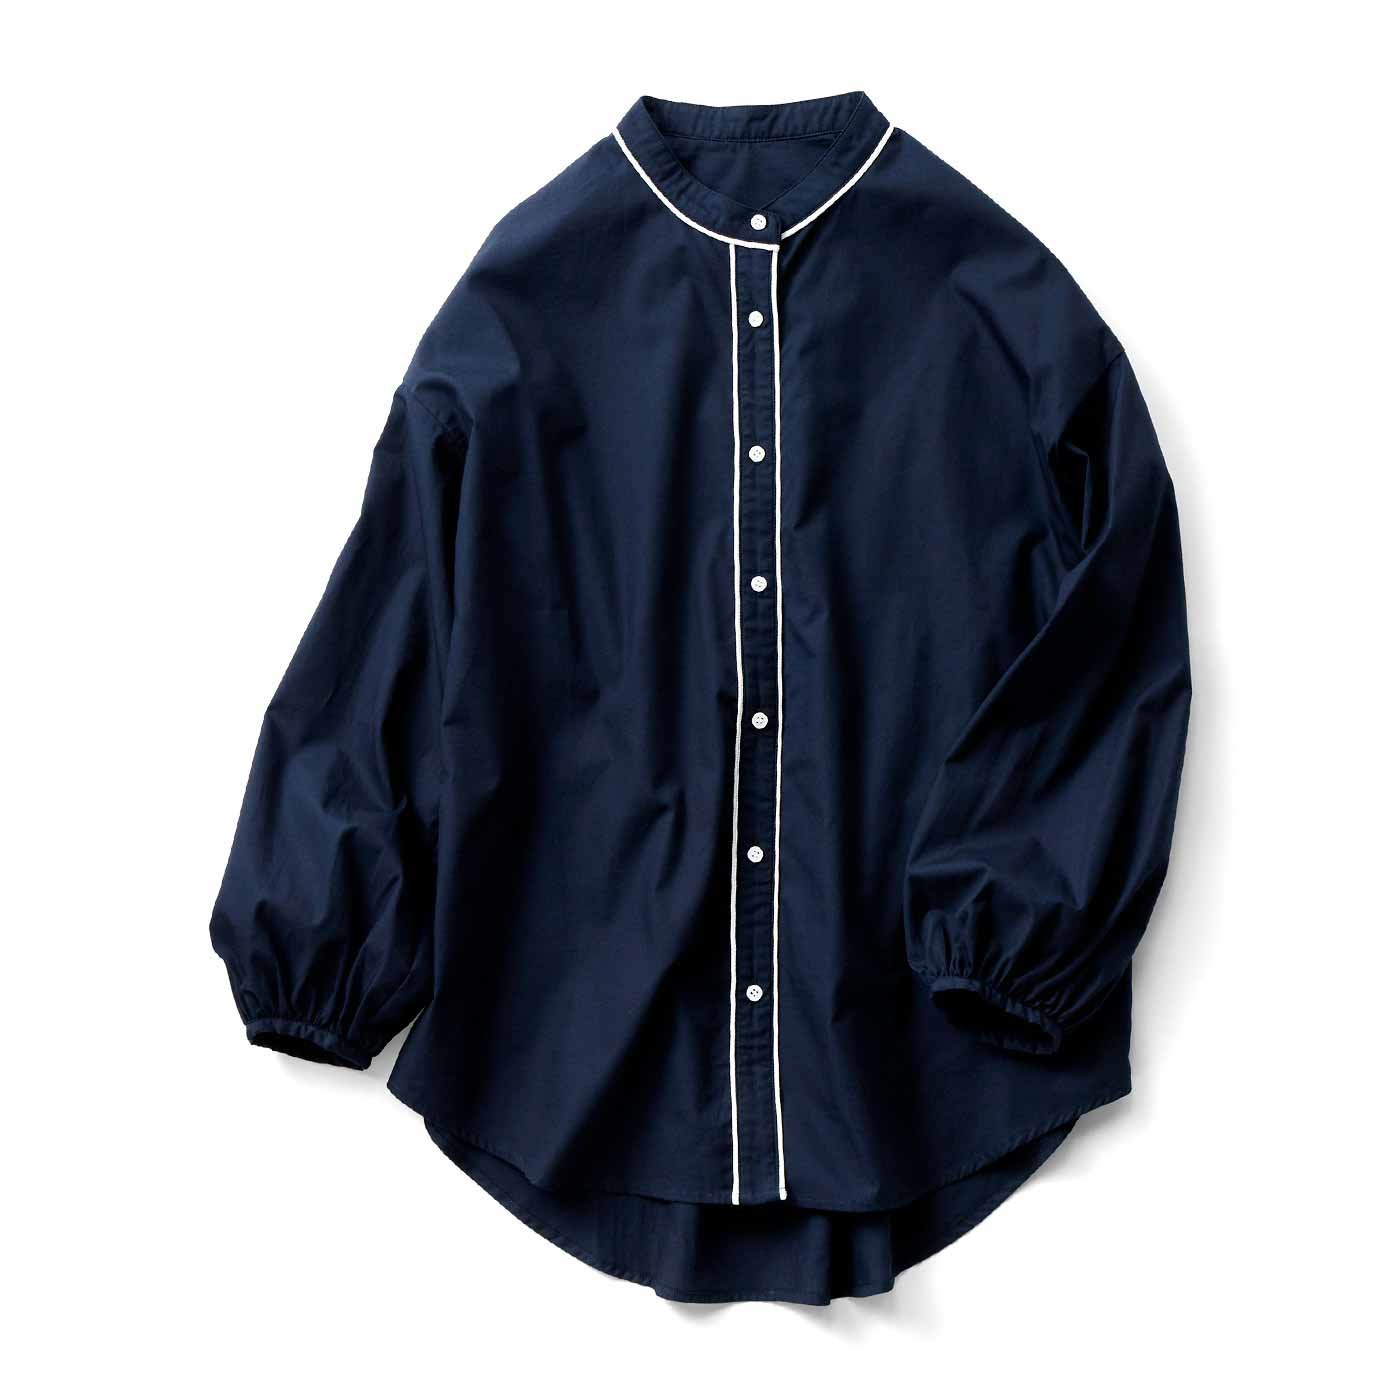 IEDIT[イディット] コーデのポイントになる きれいめパイピングシャツ〈ネイビー〉